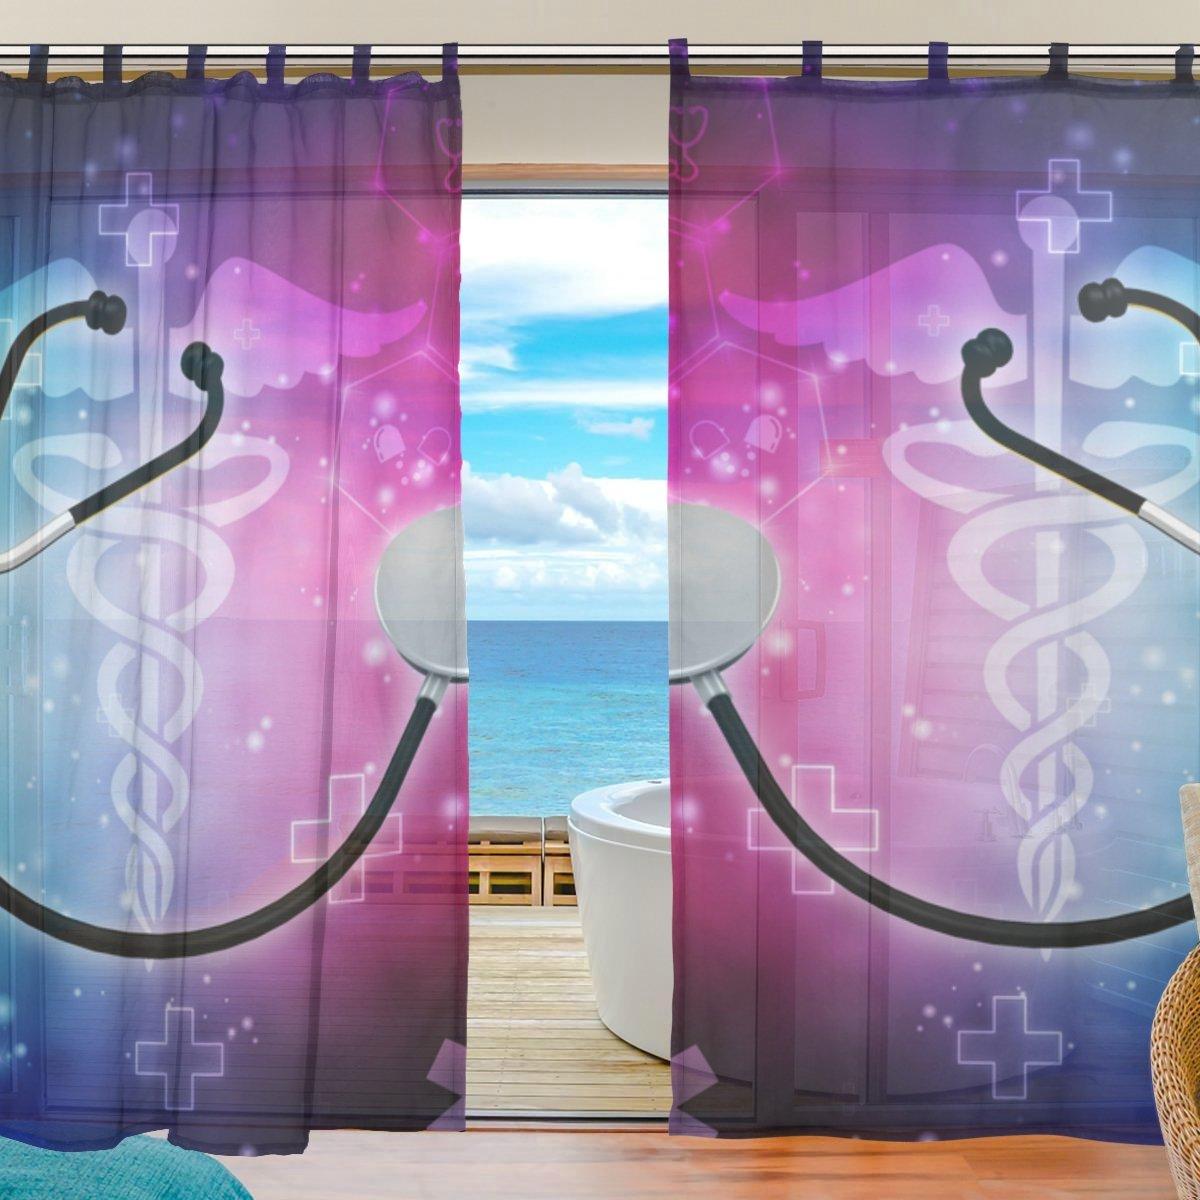 "La Random Strange Stethoscope Window Sheer Voile Curtains for Living Room Bedroom Kids Room Curtains Polyester 55""Wx78""L Per Panel Set of 2 Panels"